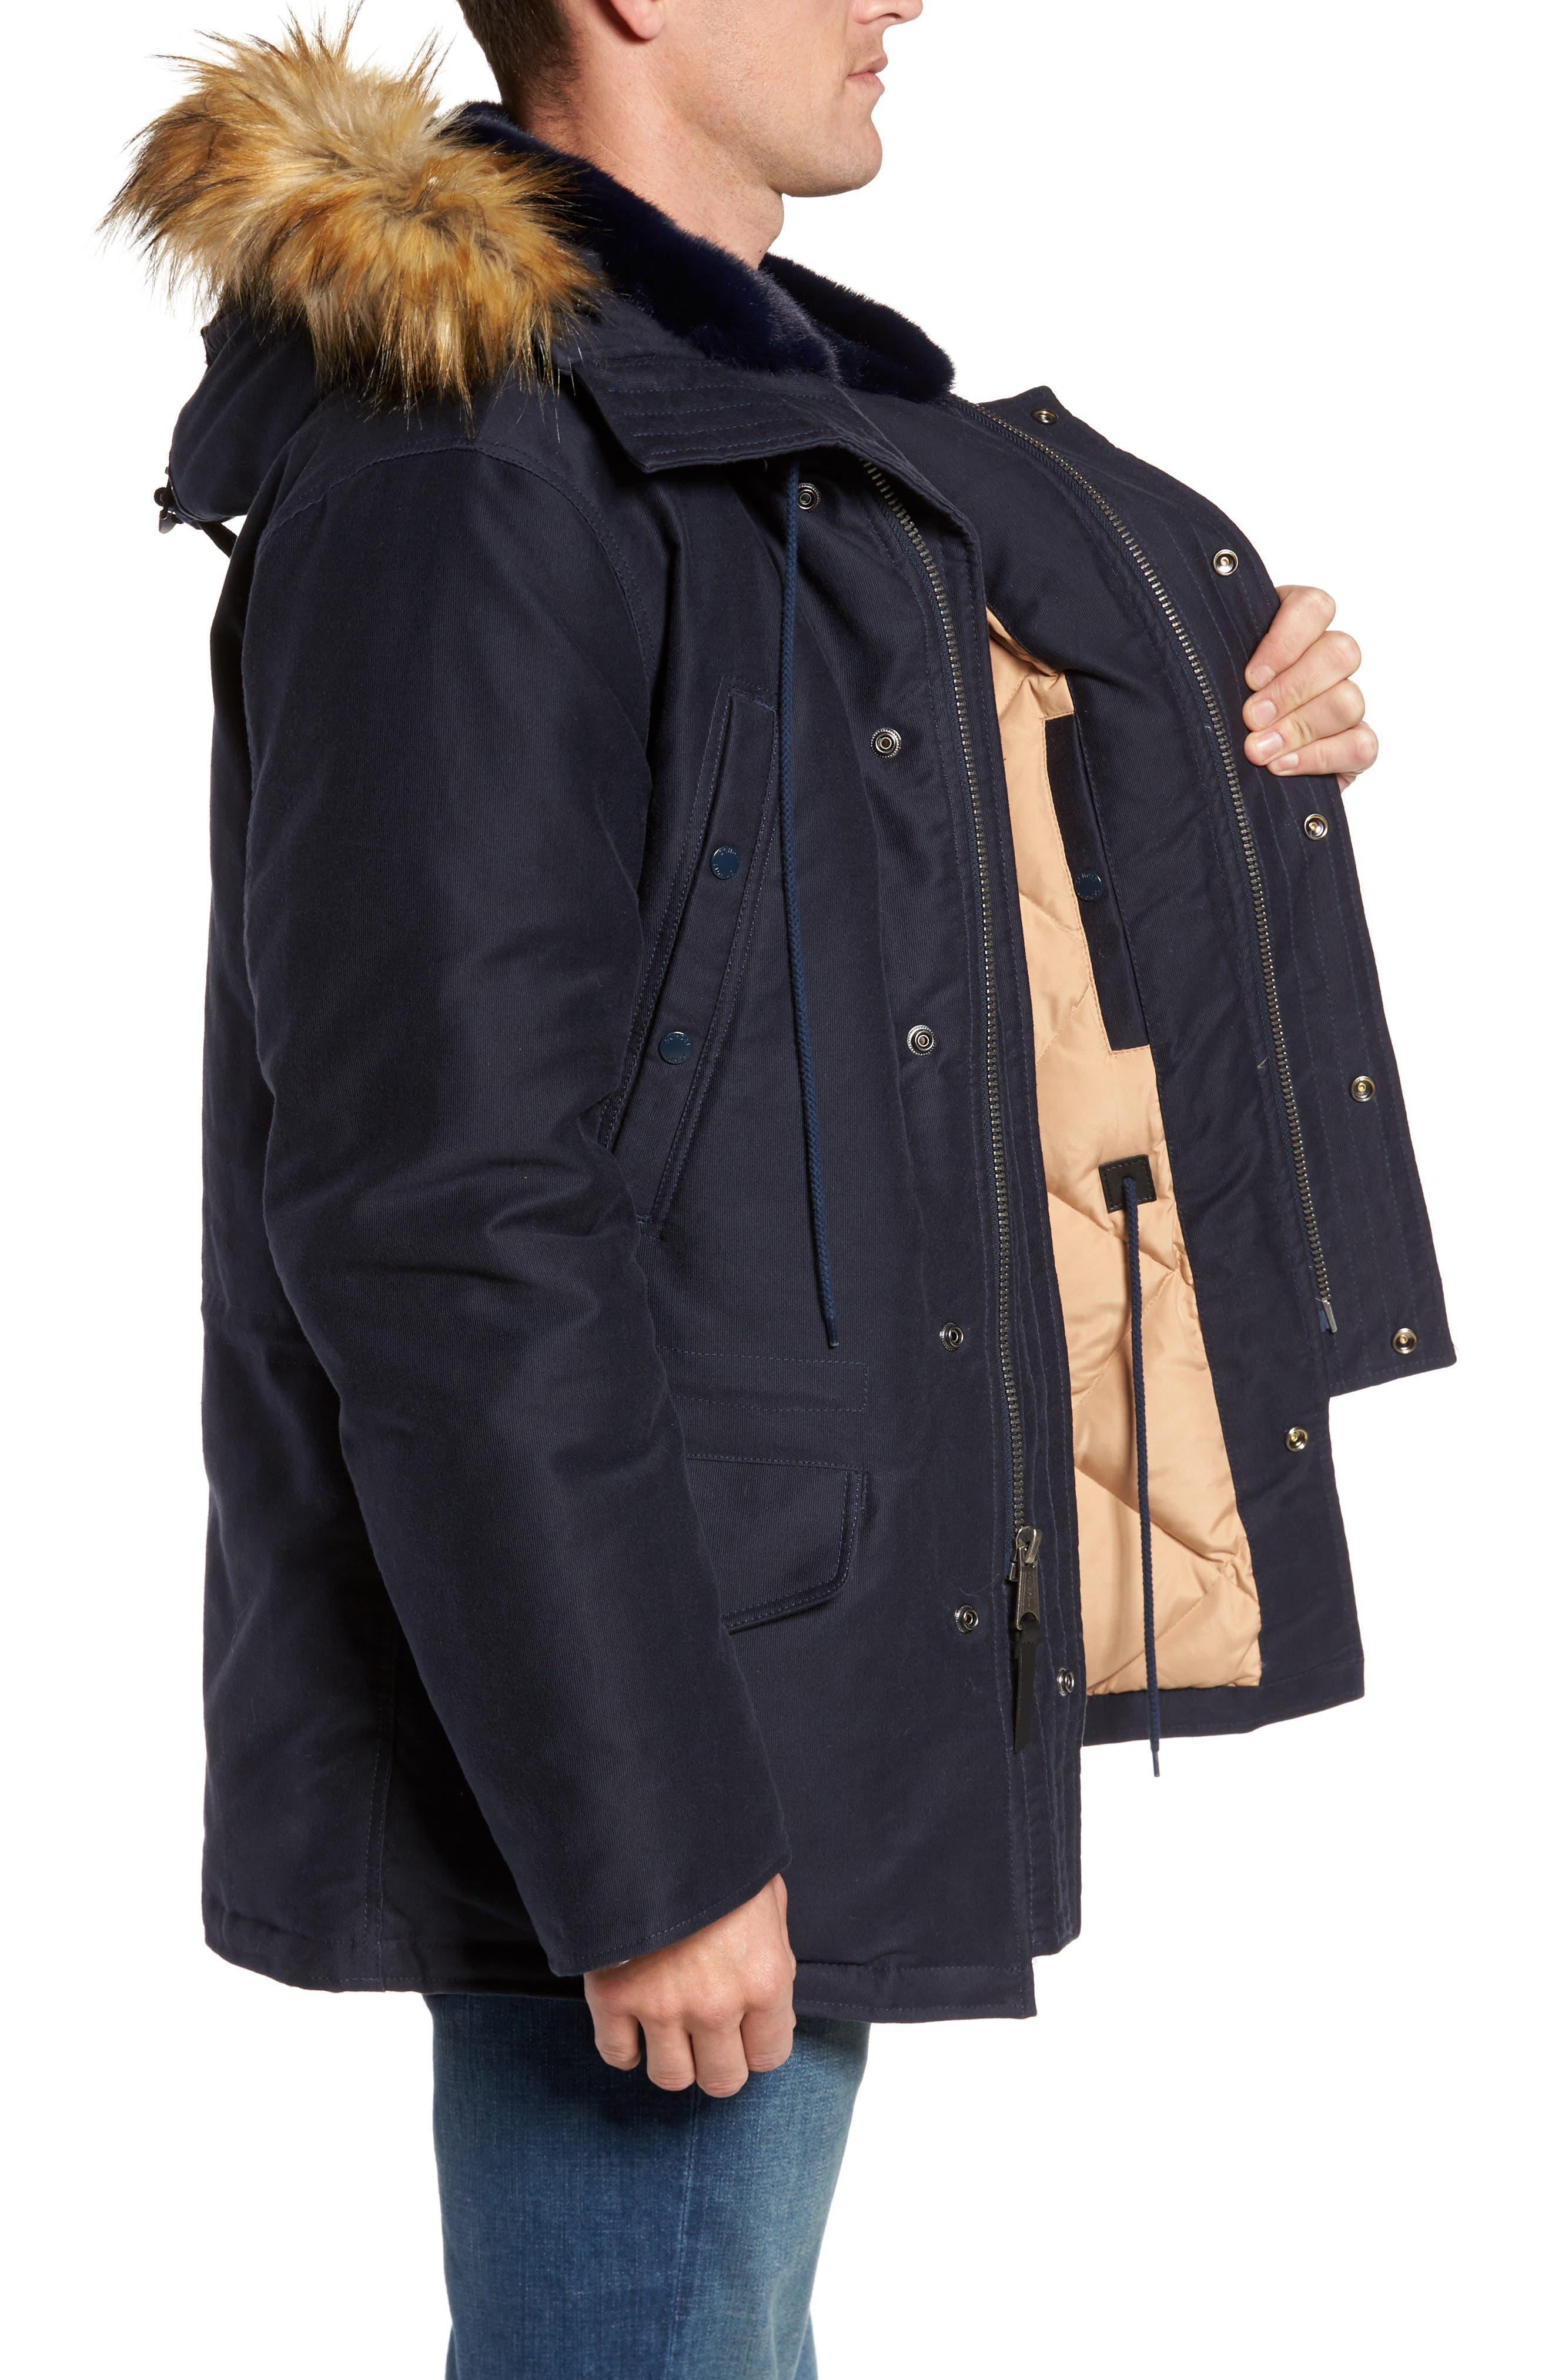 Bedford Corduroy Goose Down Jacket with Faux Fur Trim,                             Alternate thumbnail 3, color,                             Navy